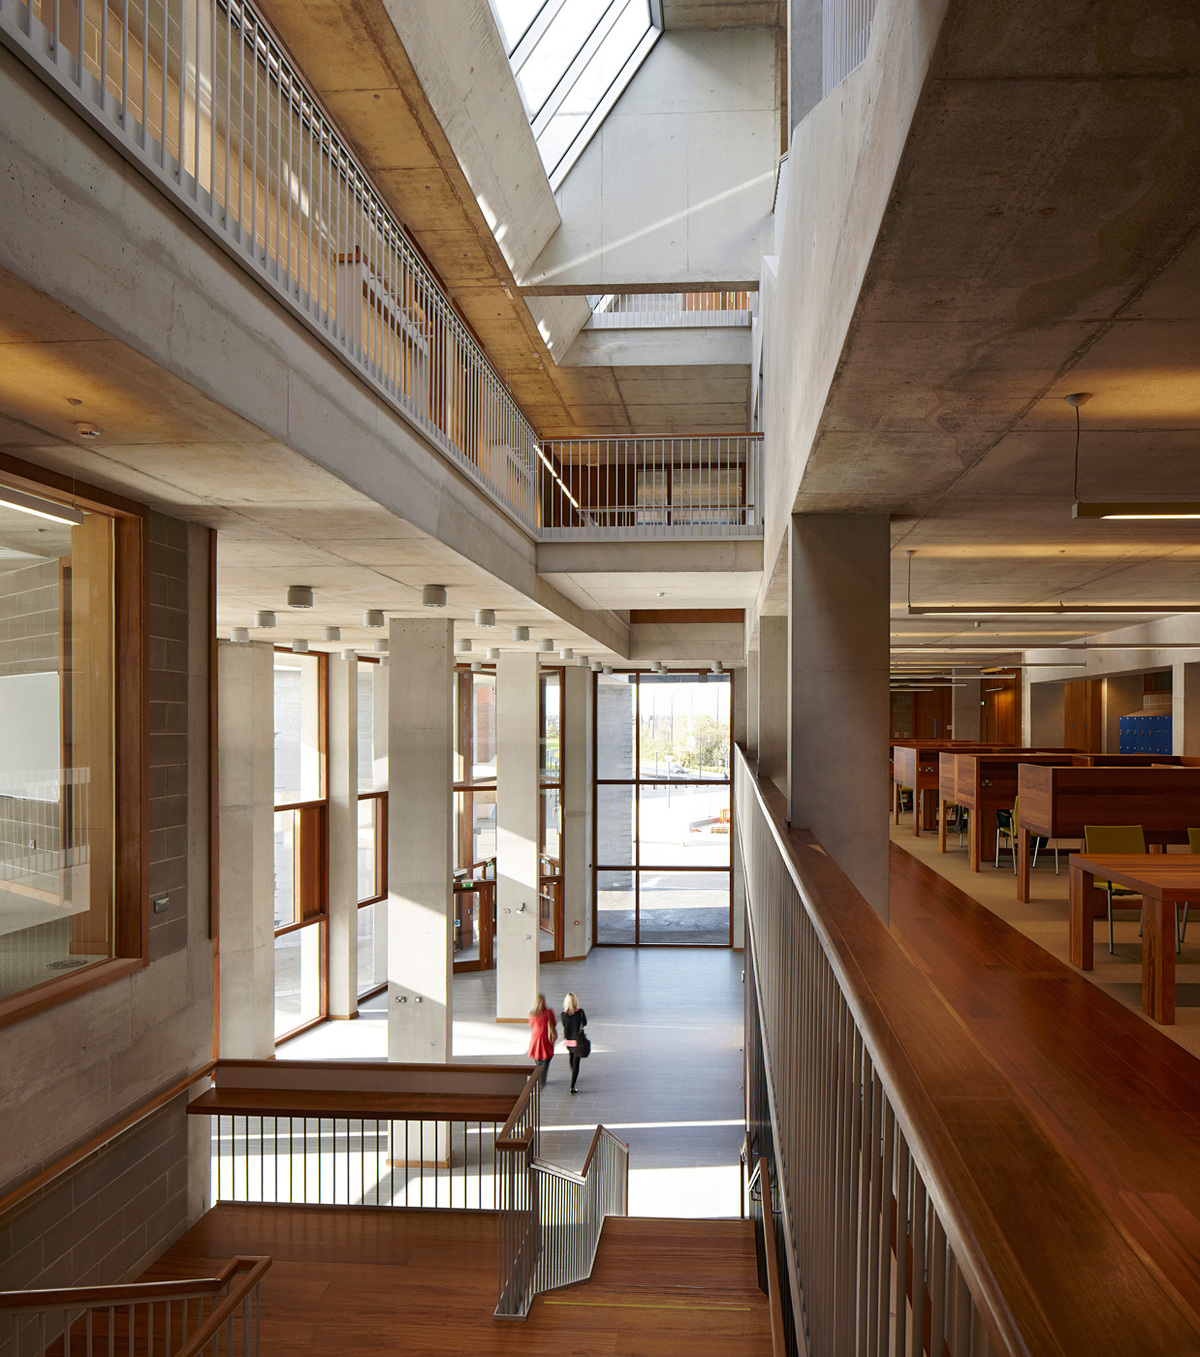 University of Limerick Medical School by Grafton Architects; Photo: Dennis Gilbert